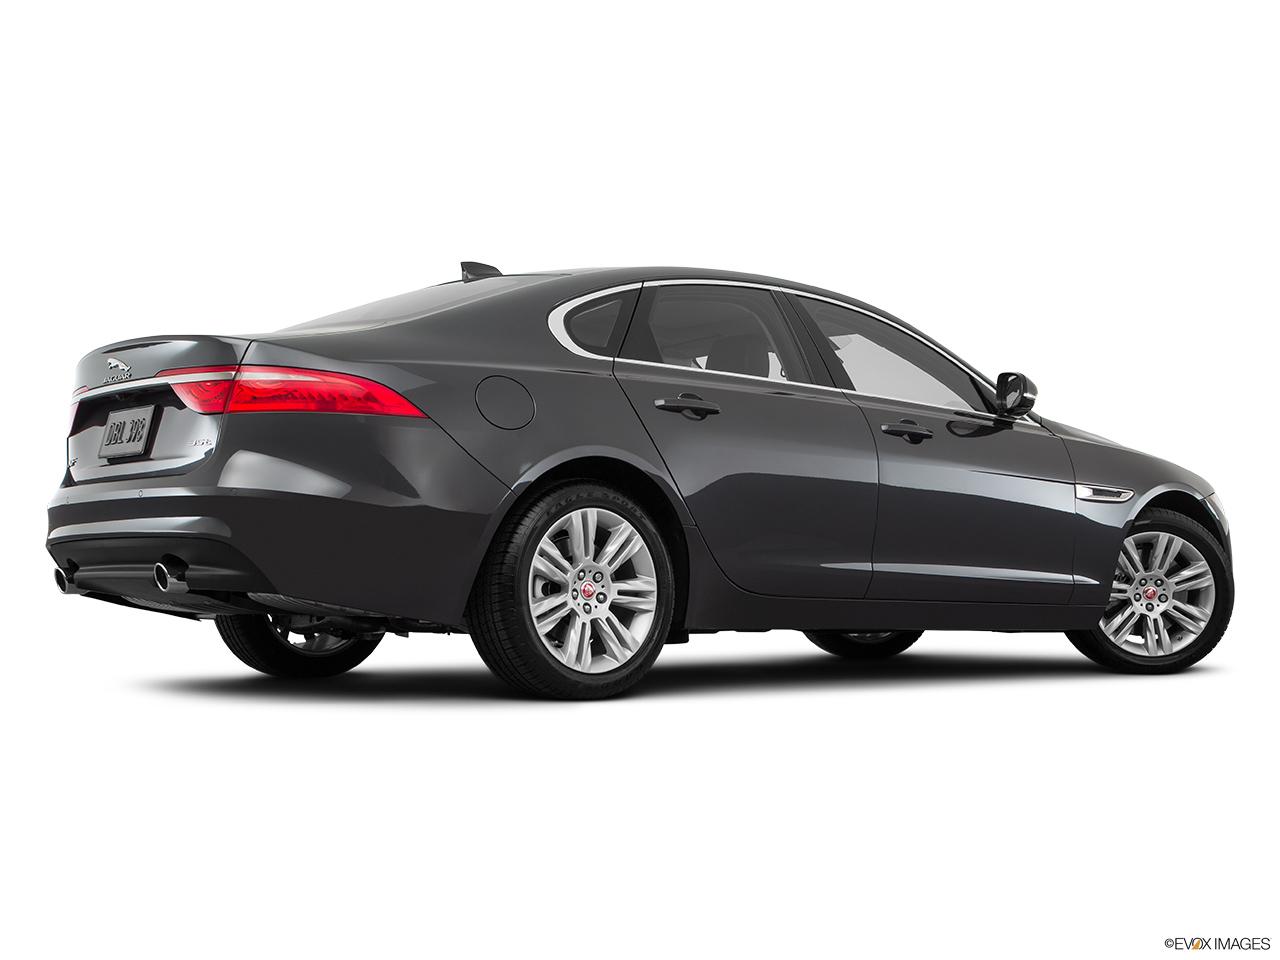 car pictures list for jaguar xf 2017 3 0 v6 sc premium luxury qatar yallamotor. Black Bedroom Furniture Sets. Home Design Ideas